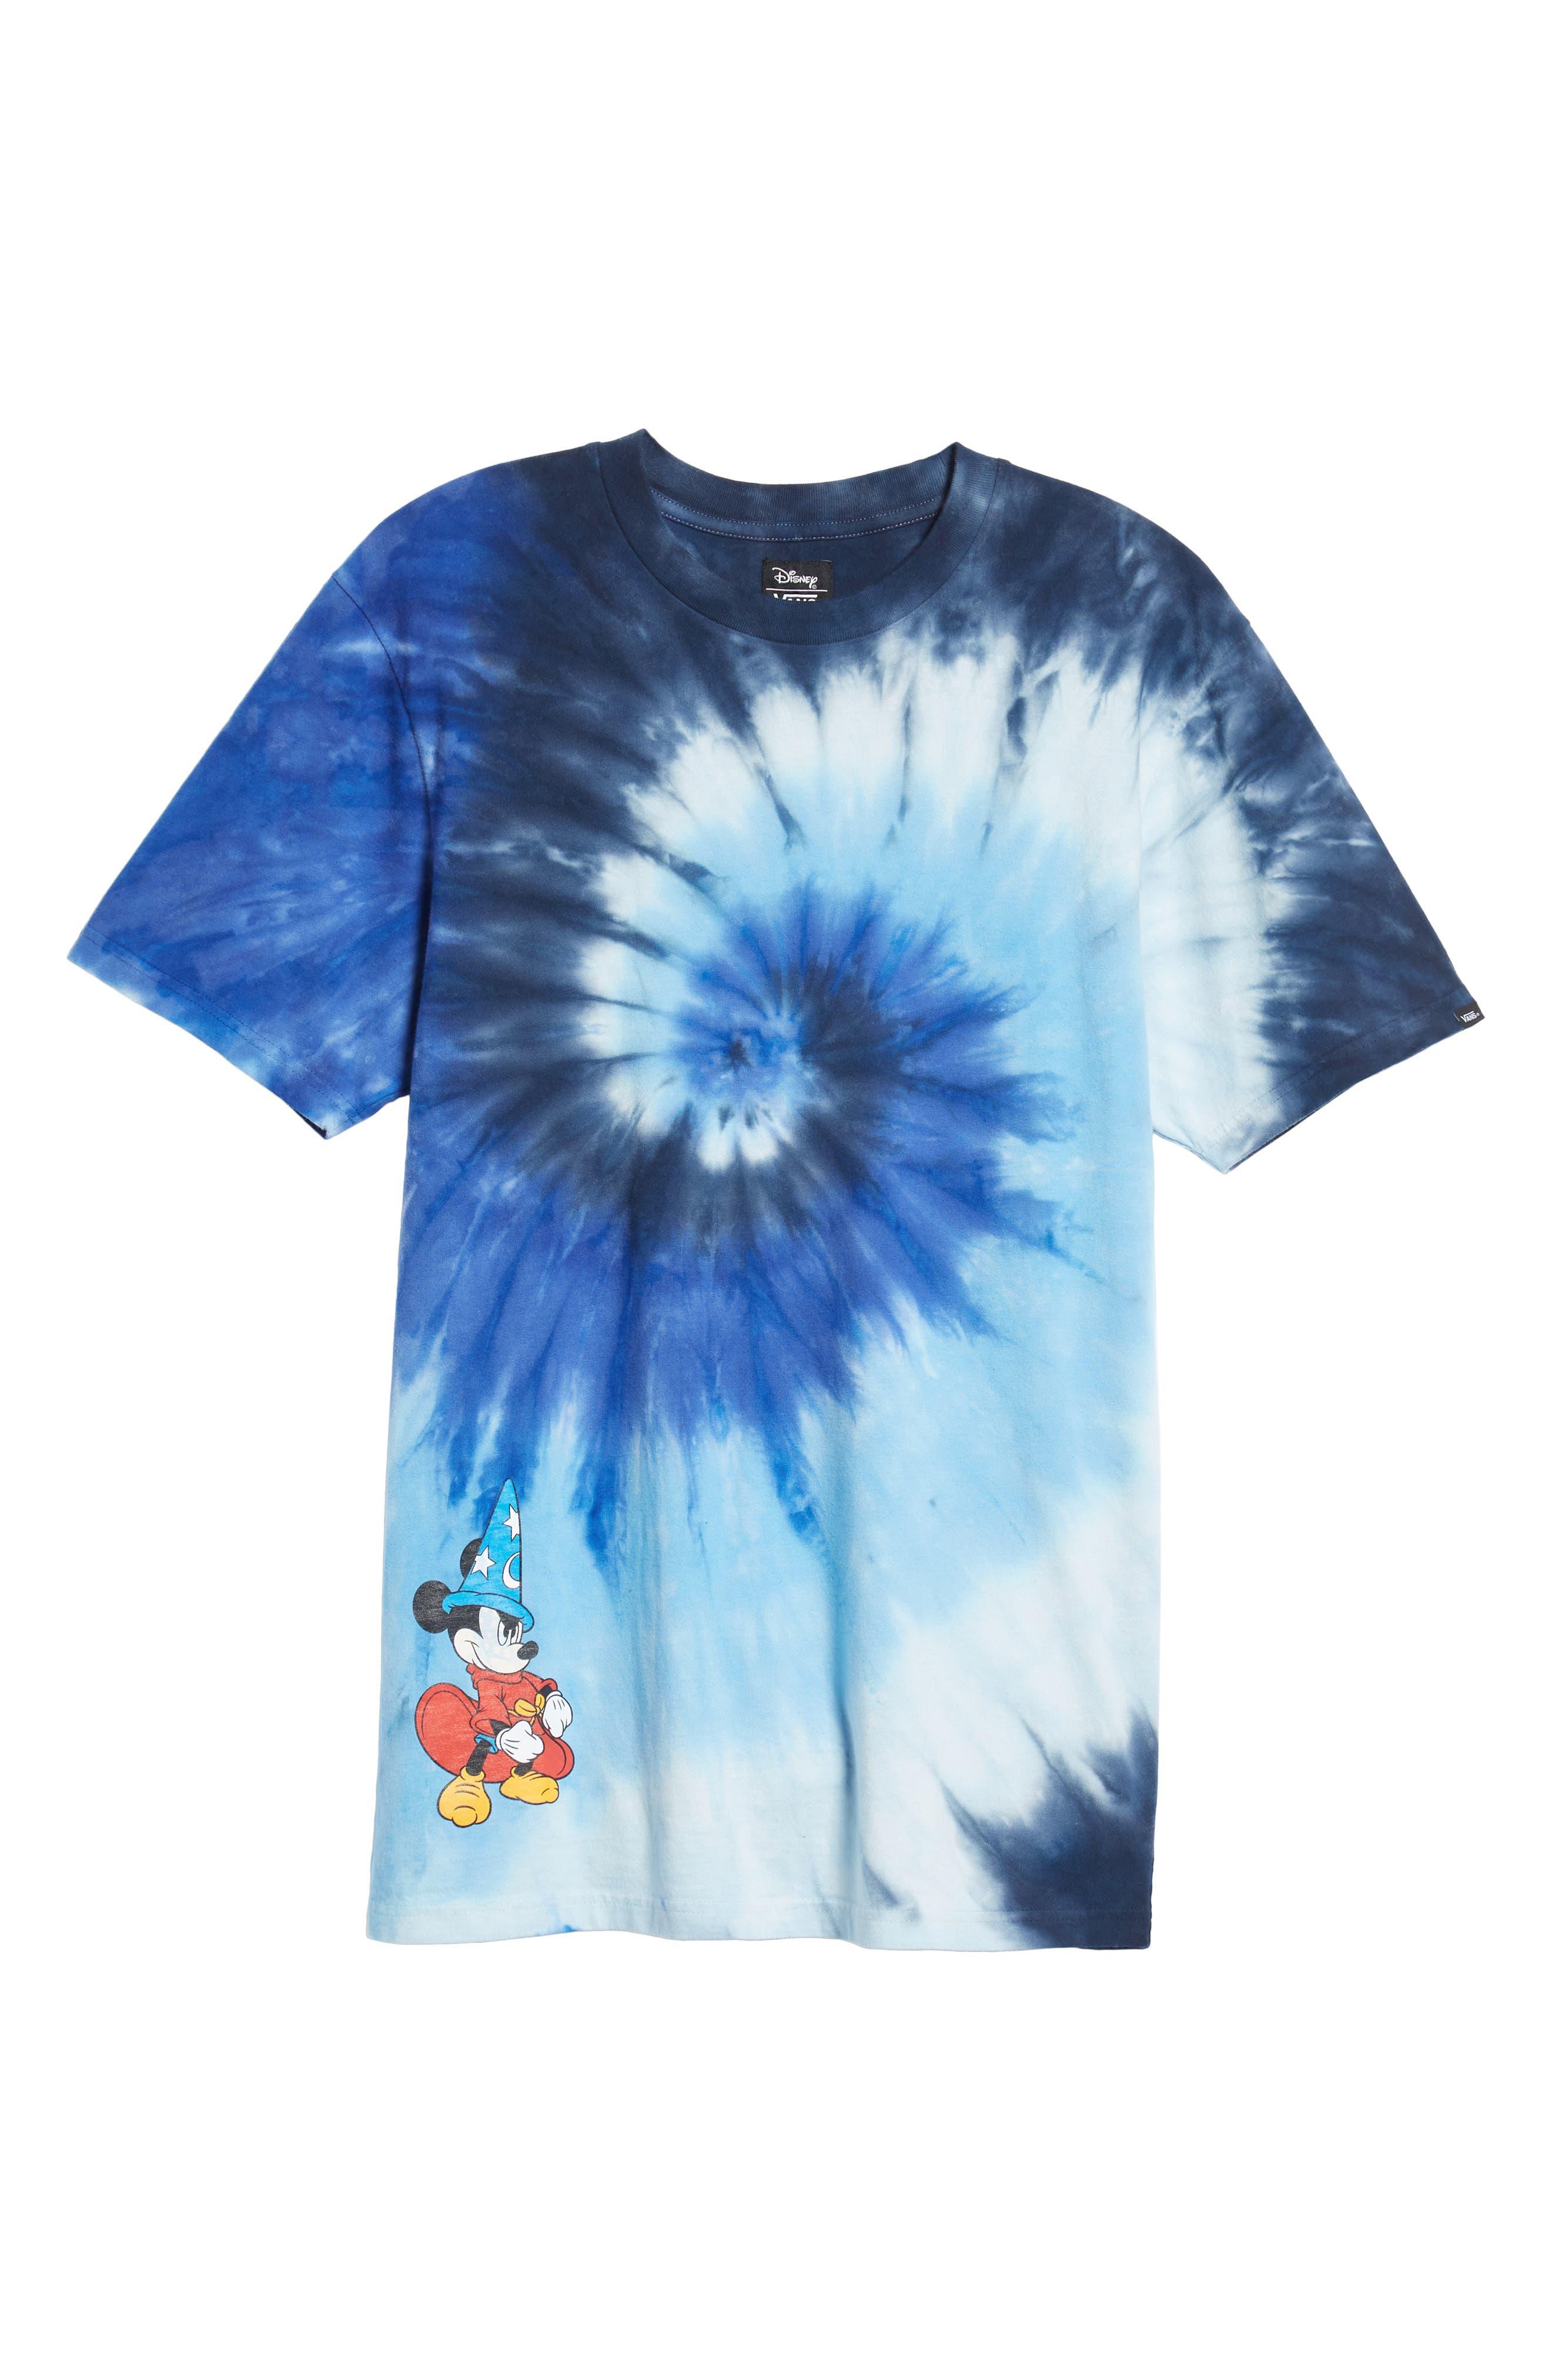 x Disney Mickey's 90th Anniversary T-Shirt,                             Alternate thumbnail 6, color,                             MICKEY FANTASIA TIE DYE